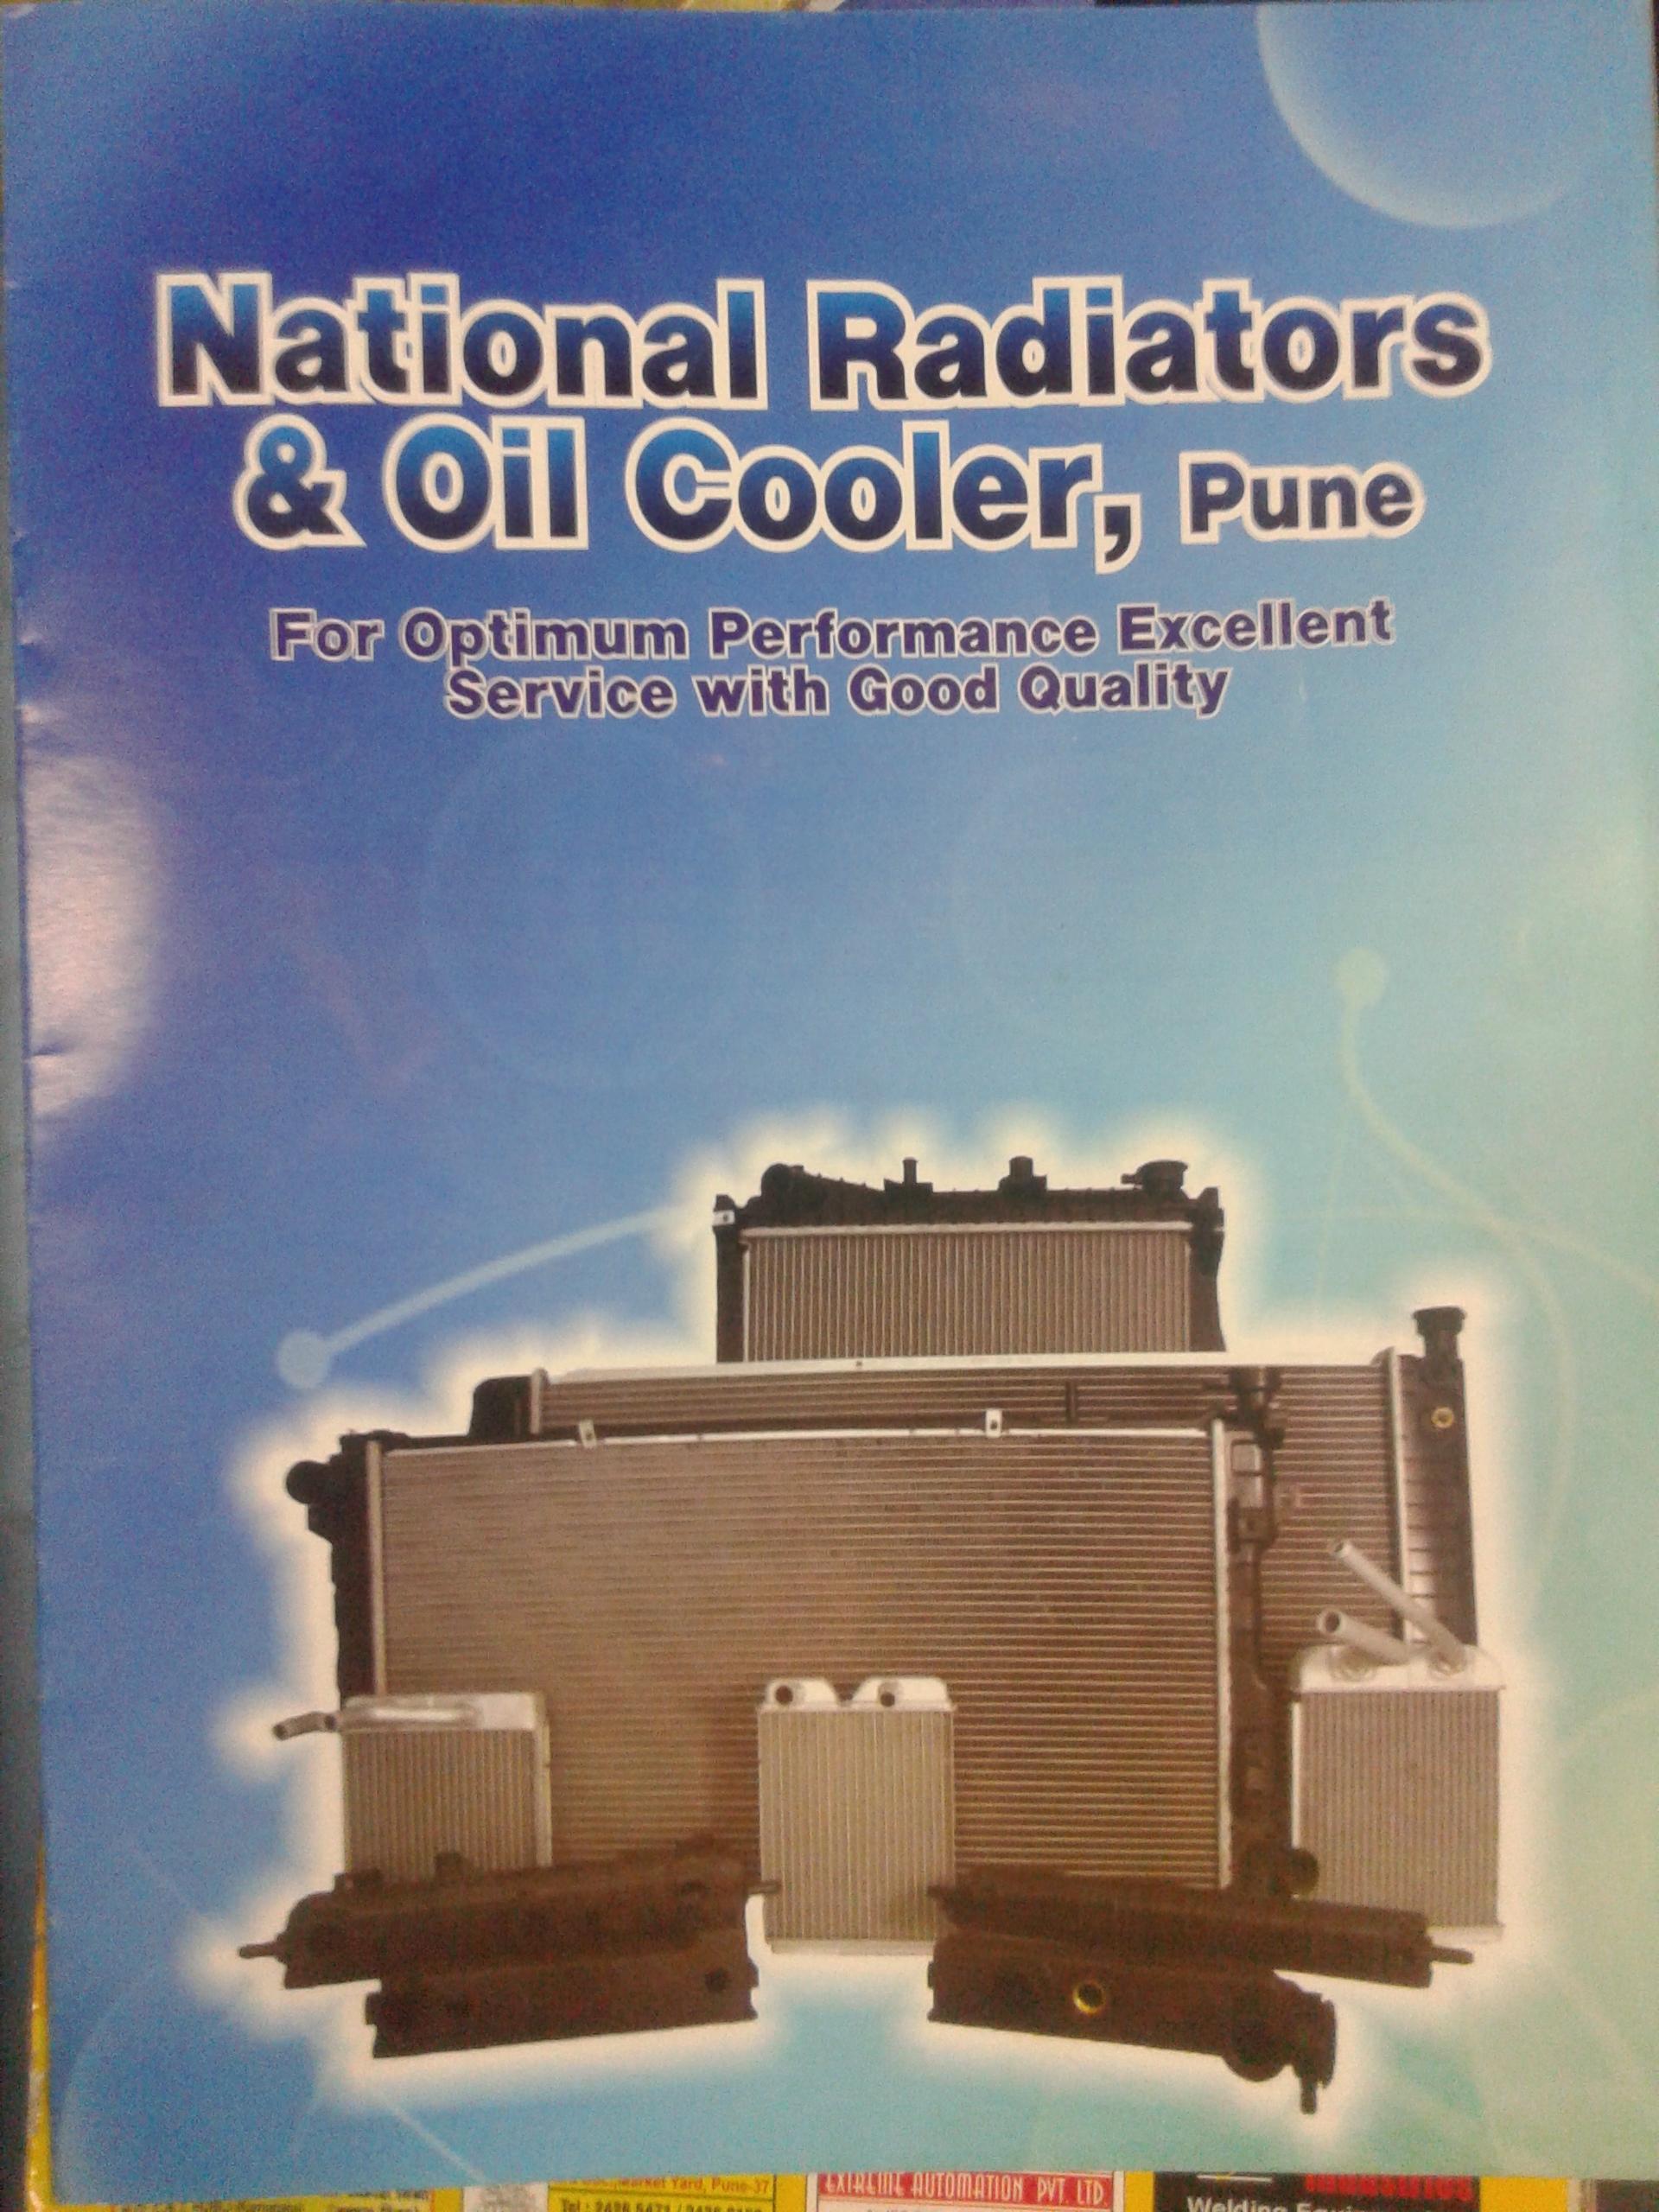 National Radiators & Oil Cooler, Pune